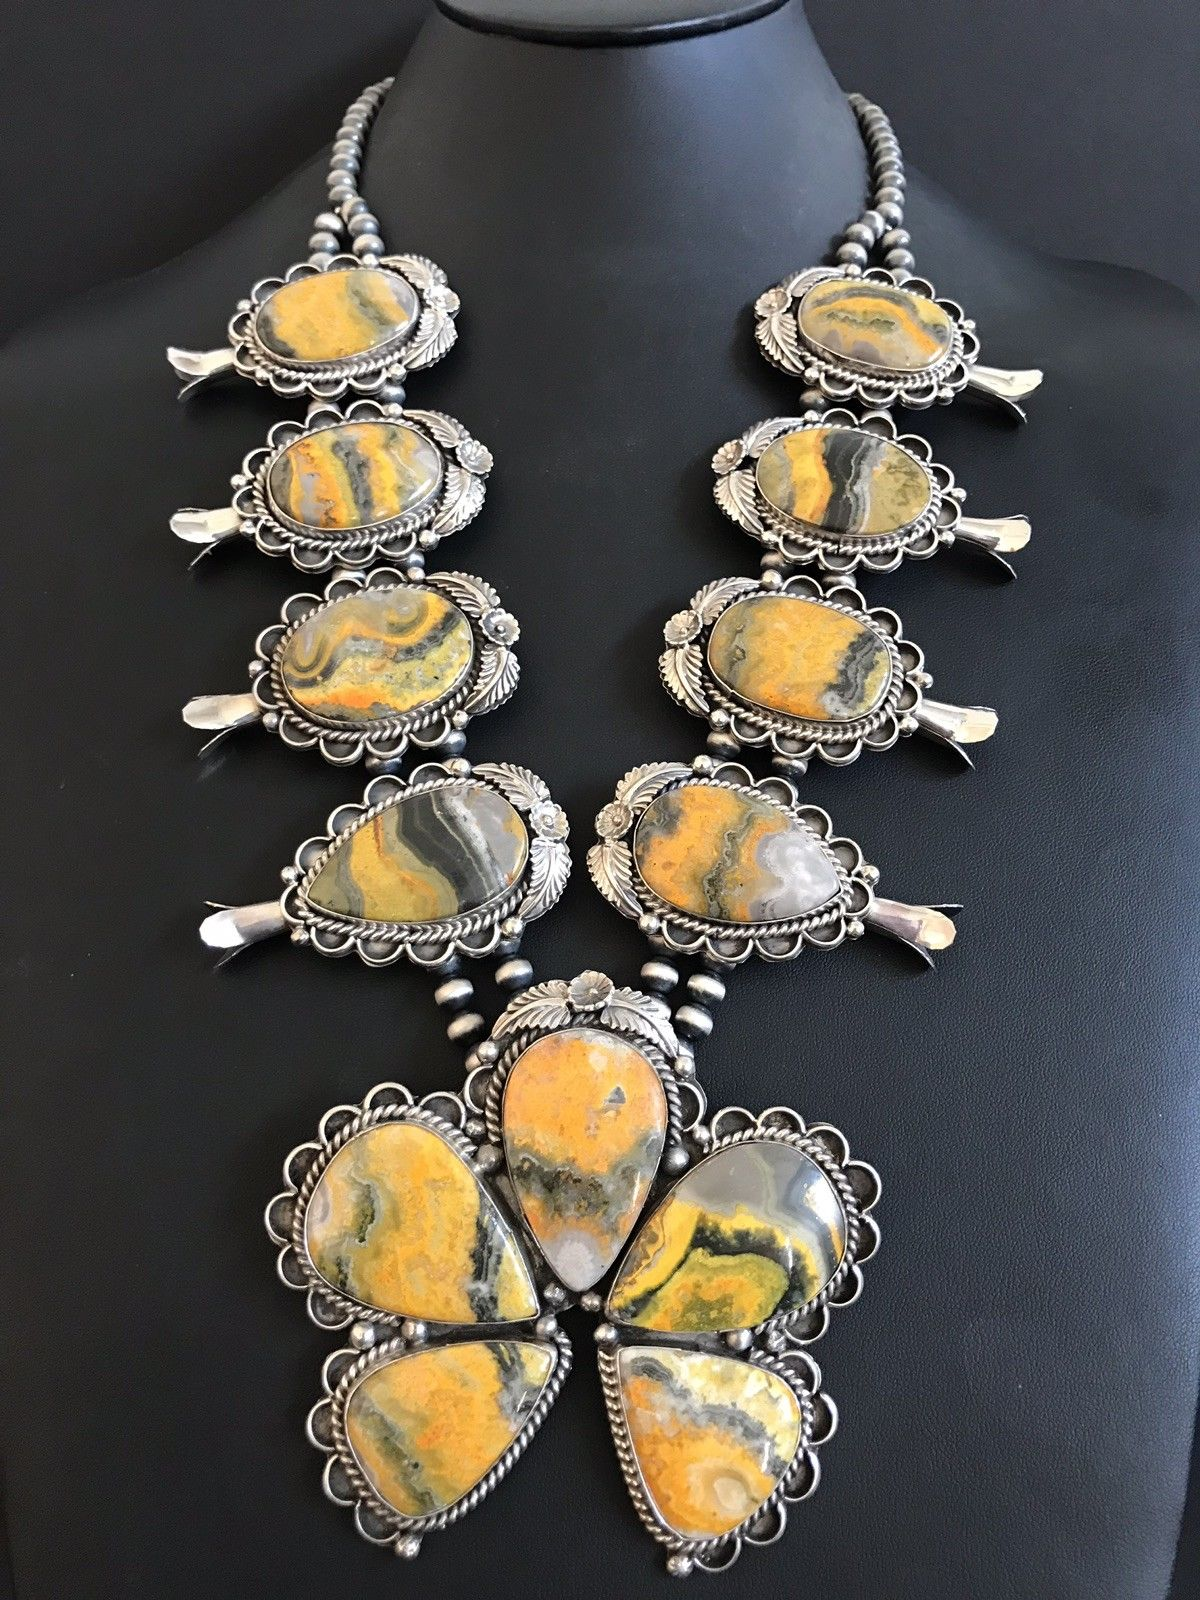 b22571bbf Navajo sterling and Bumblebee jasper squash blossom necklace ...